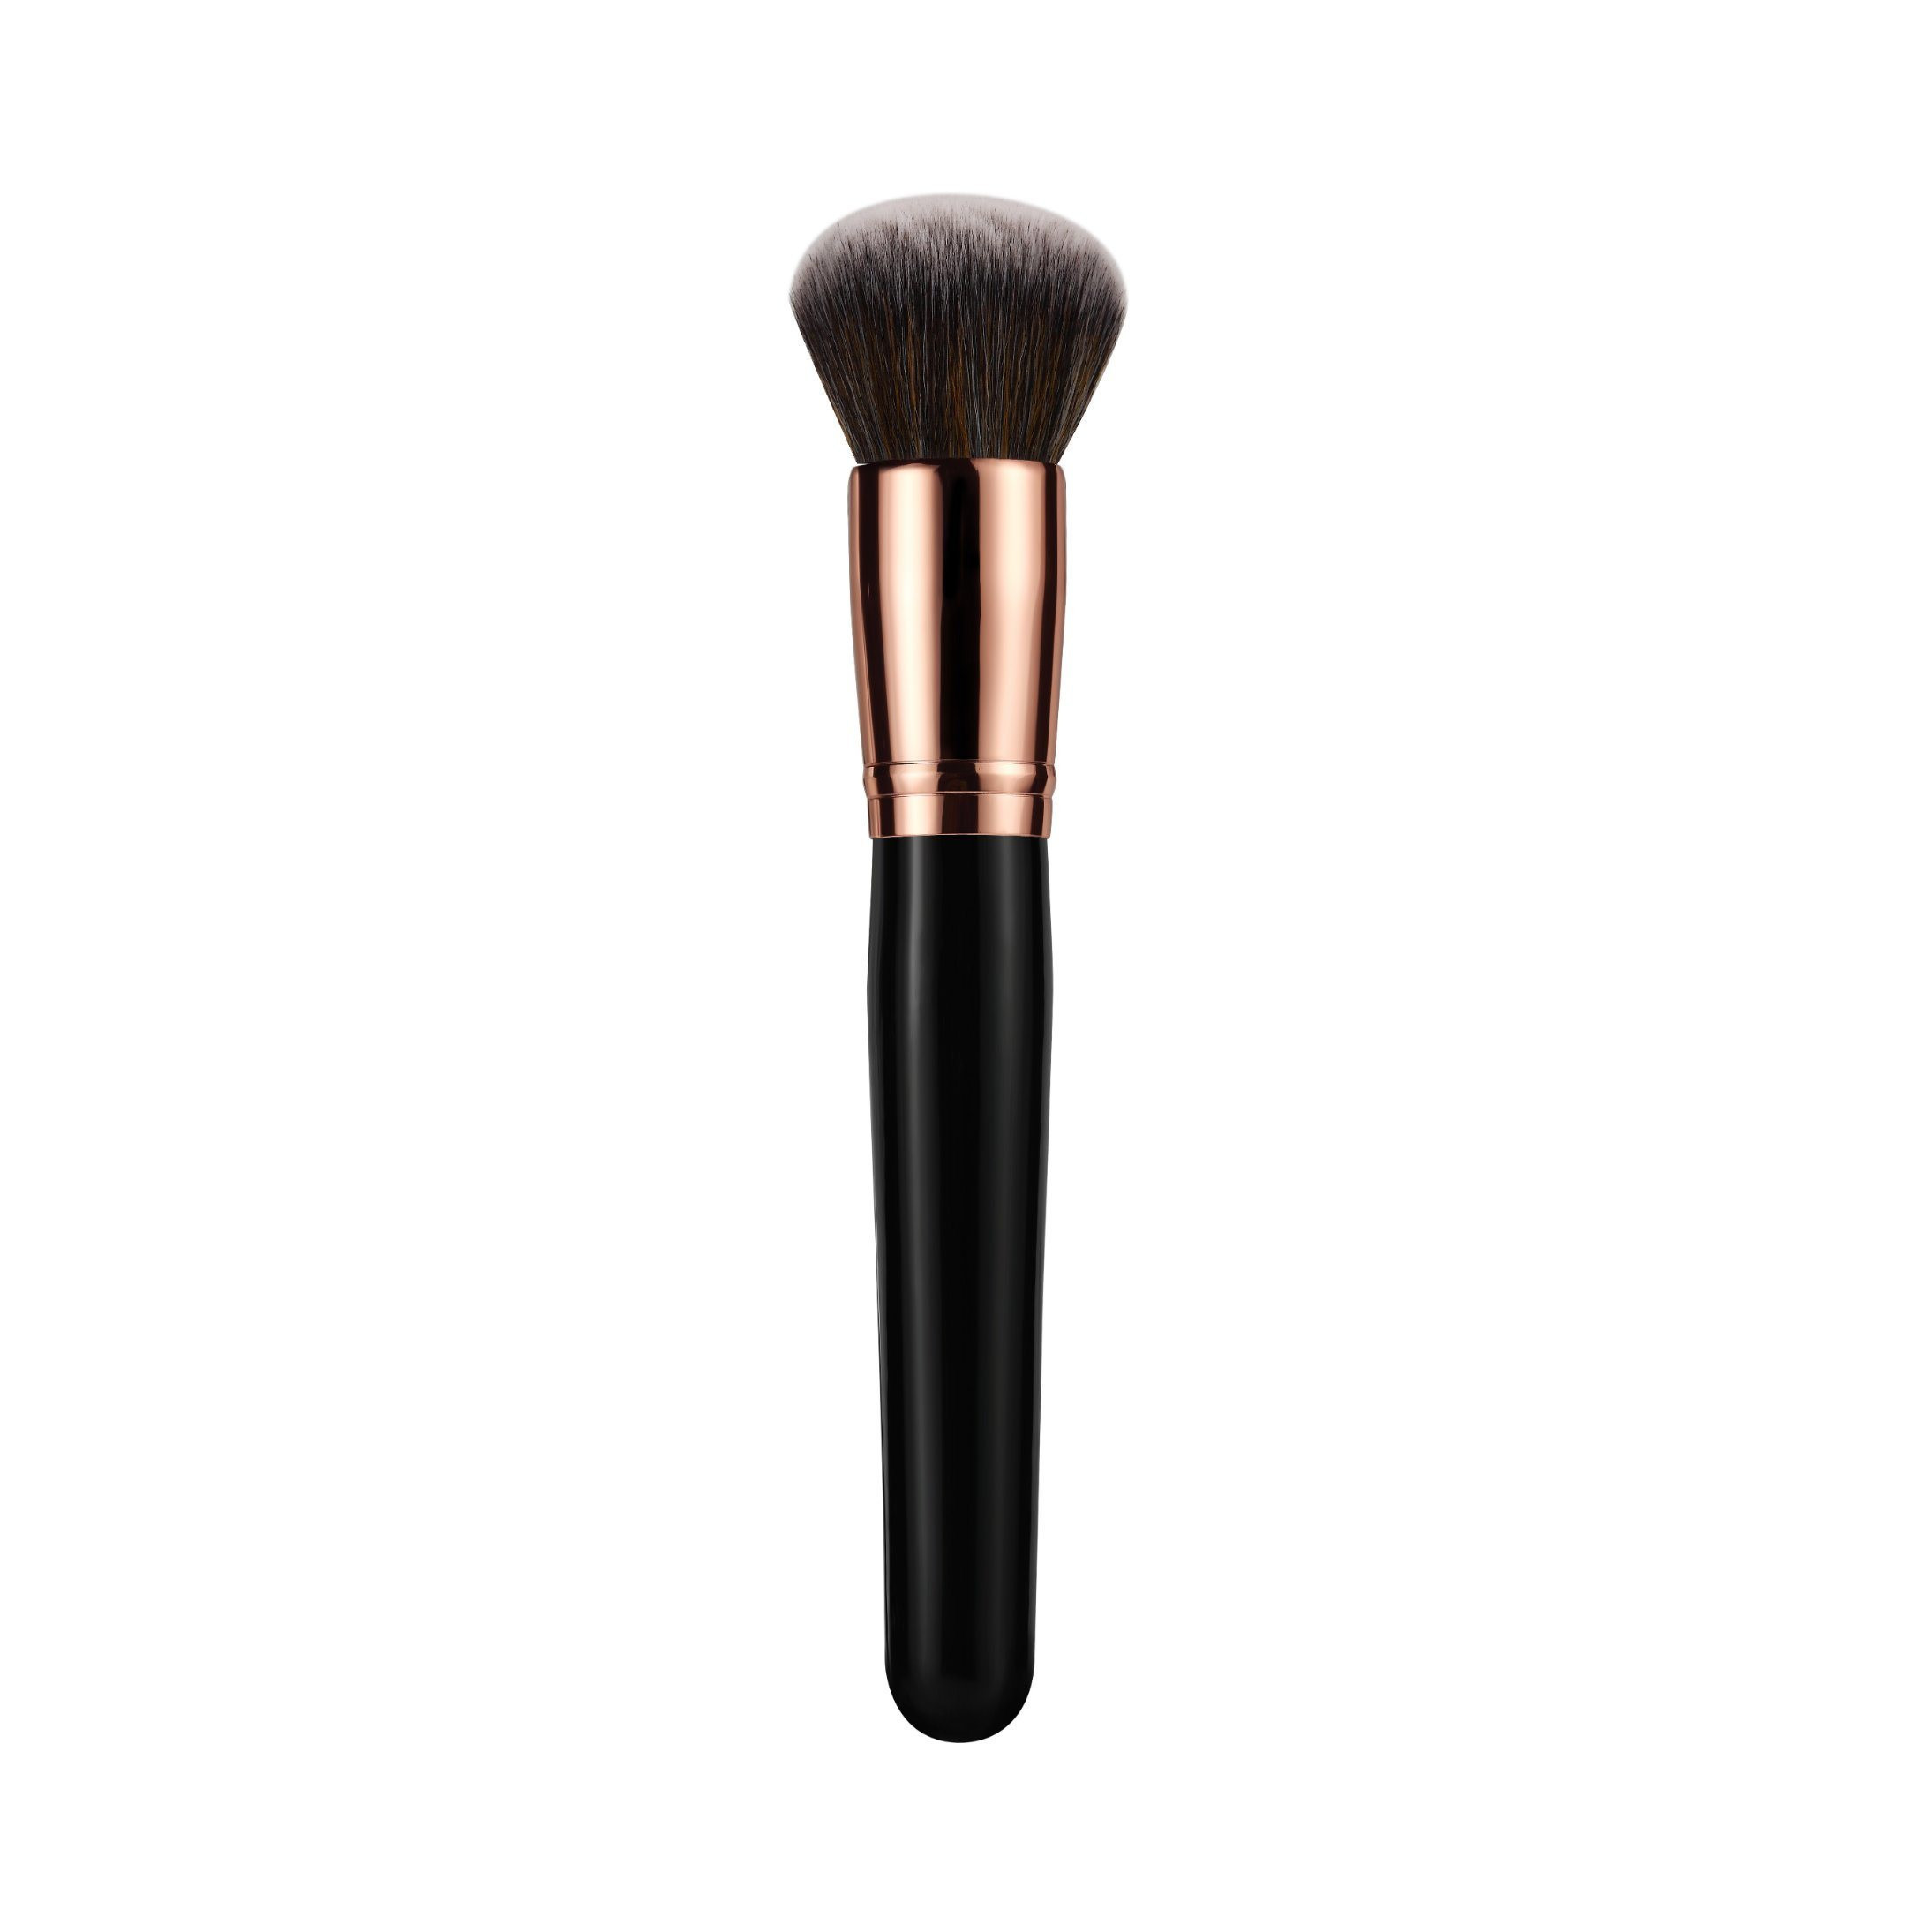 2019 New Design Hot Sales Vegan Synthetic Makeup Brush Set with Portable Bag.